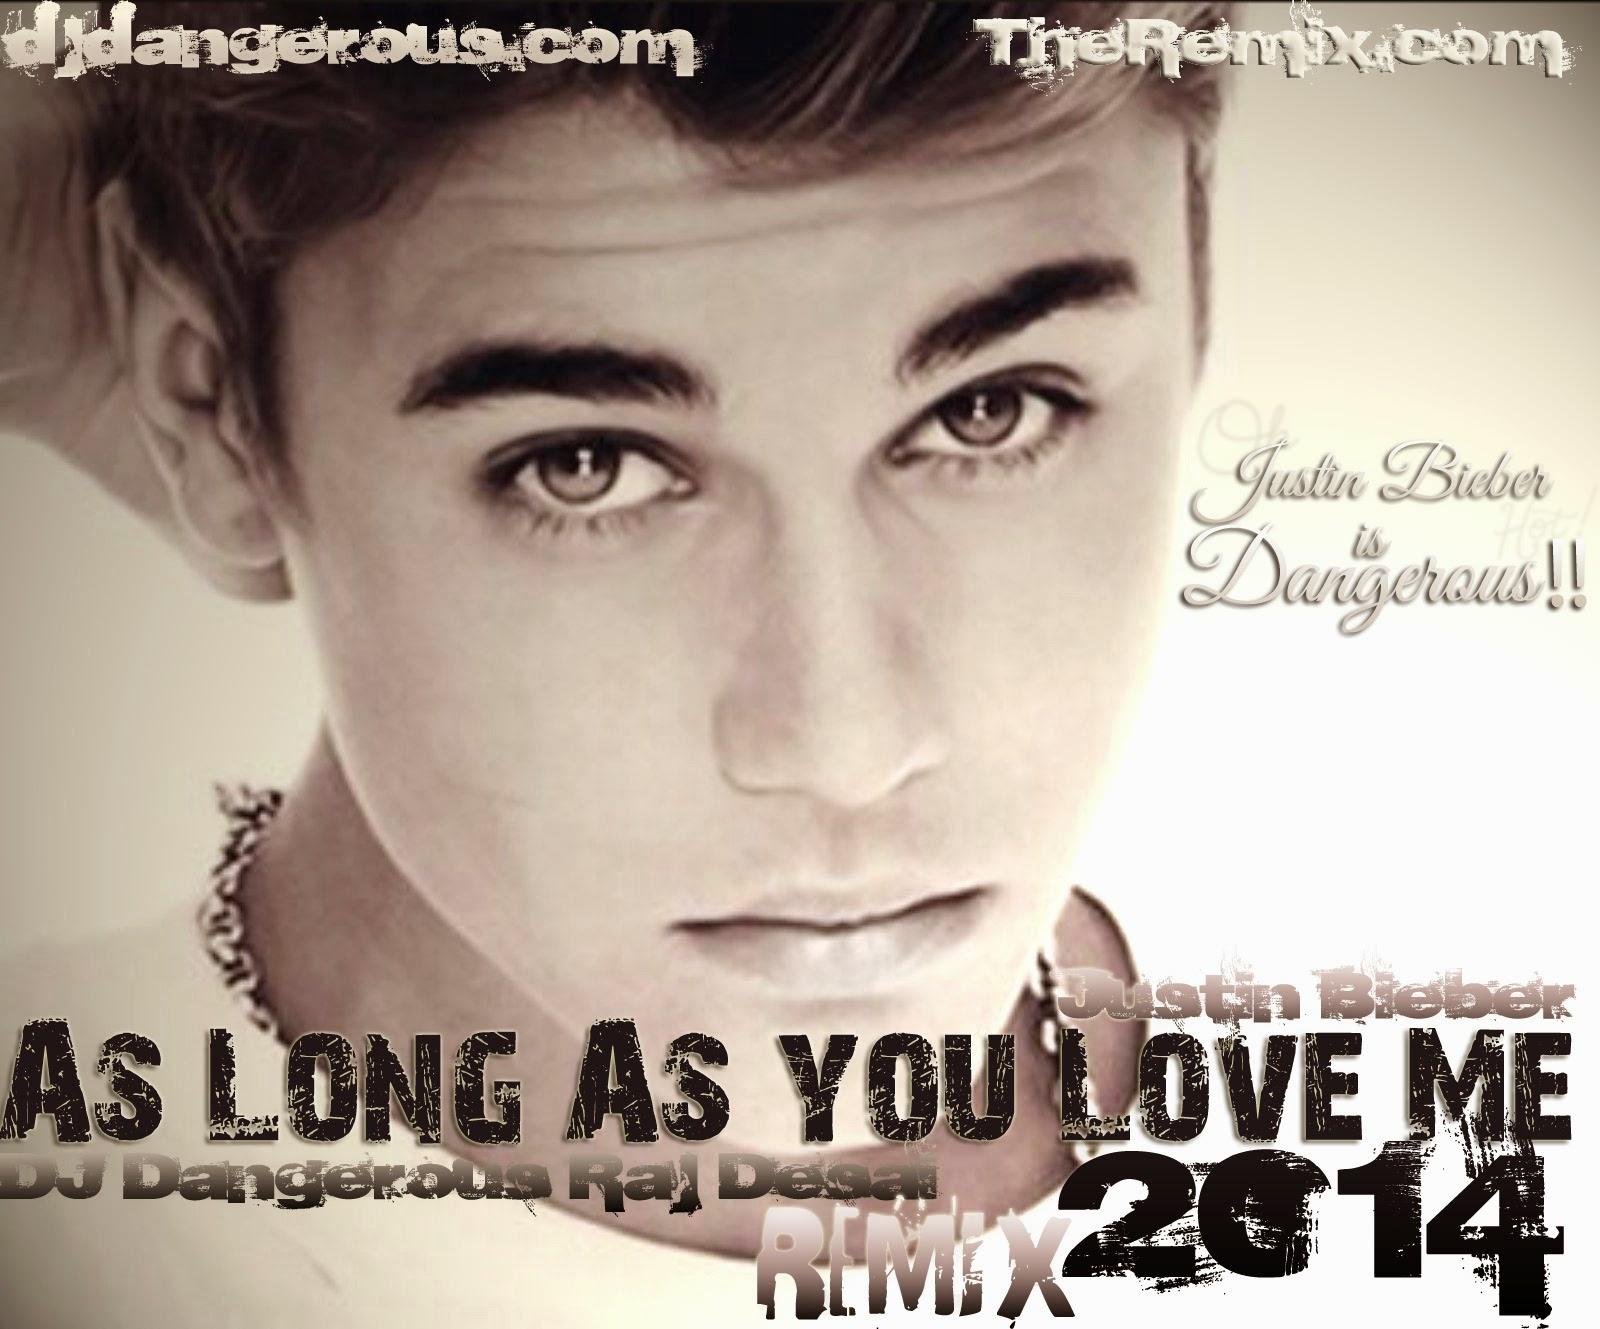 Justin bieber скачать as long as you love me.